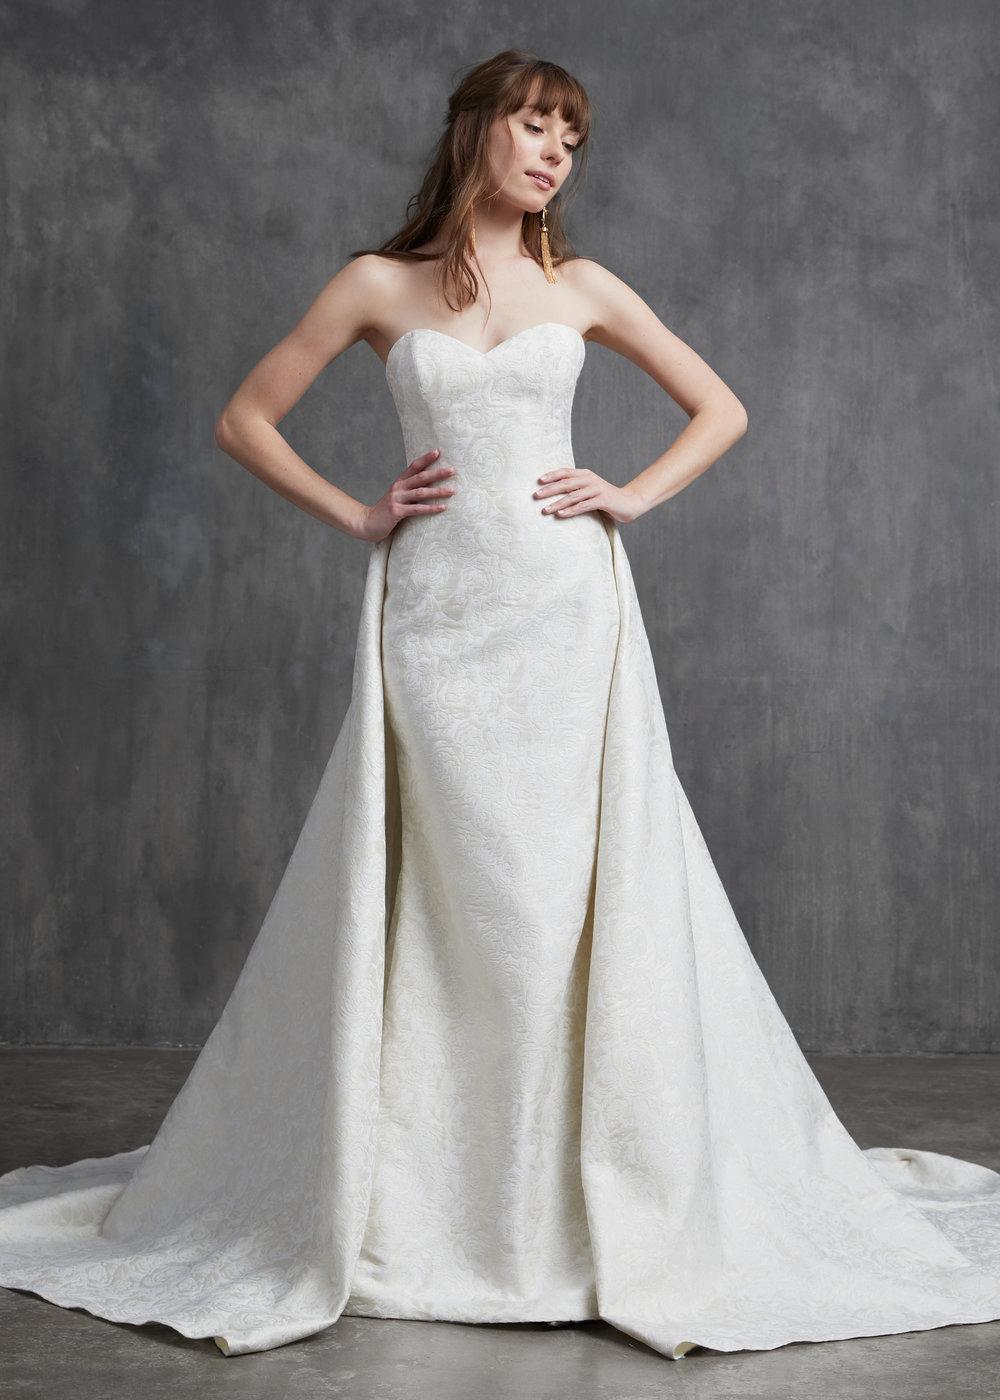 kelly faetanini monroe wedding dress